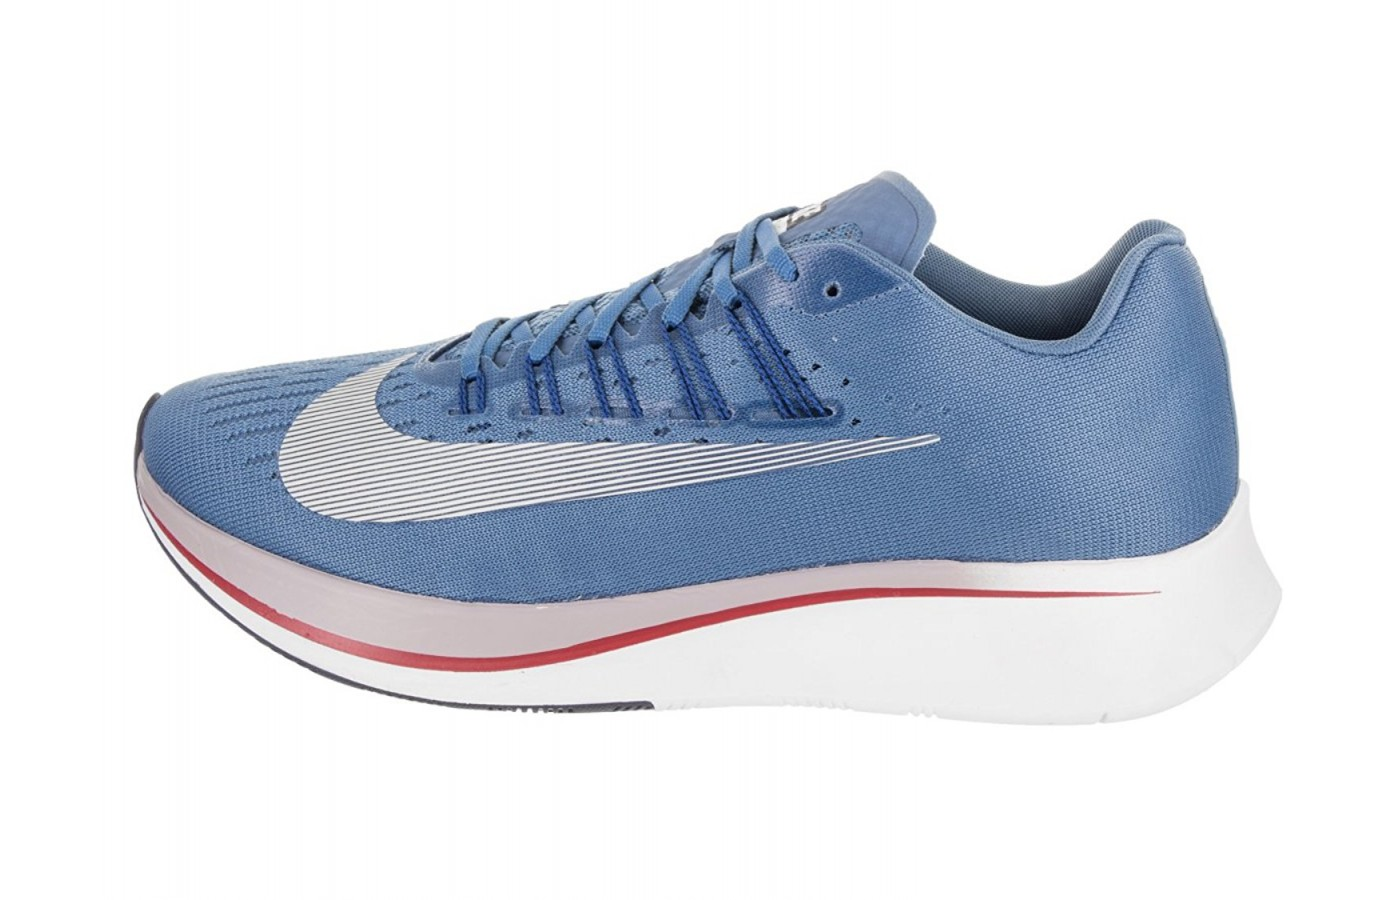 Nike Zoom Fly side